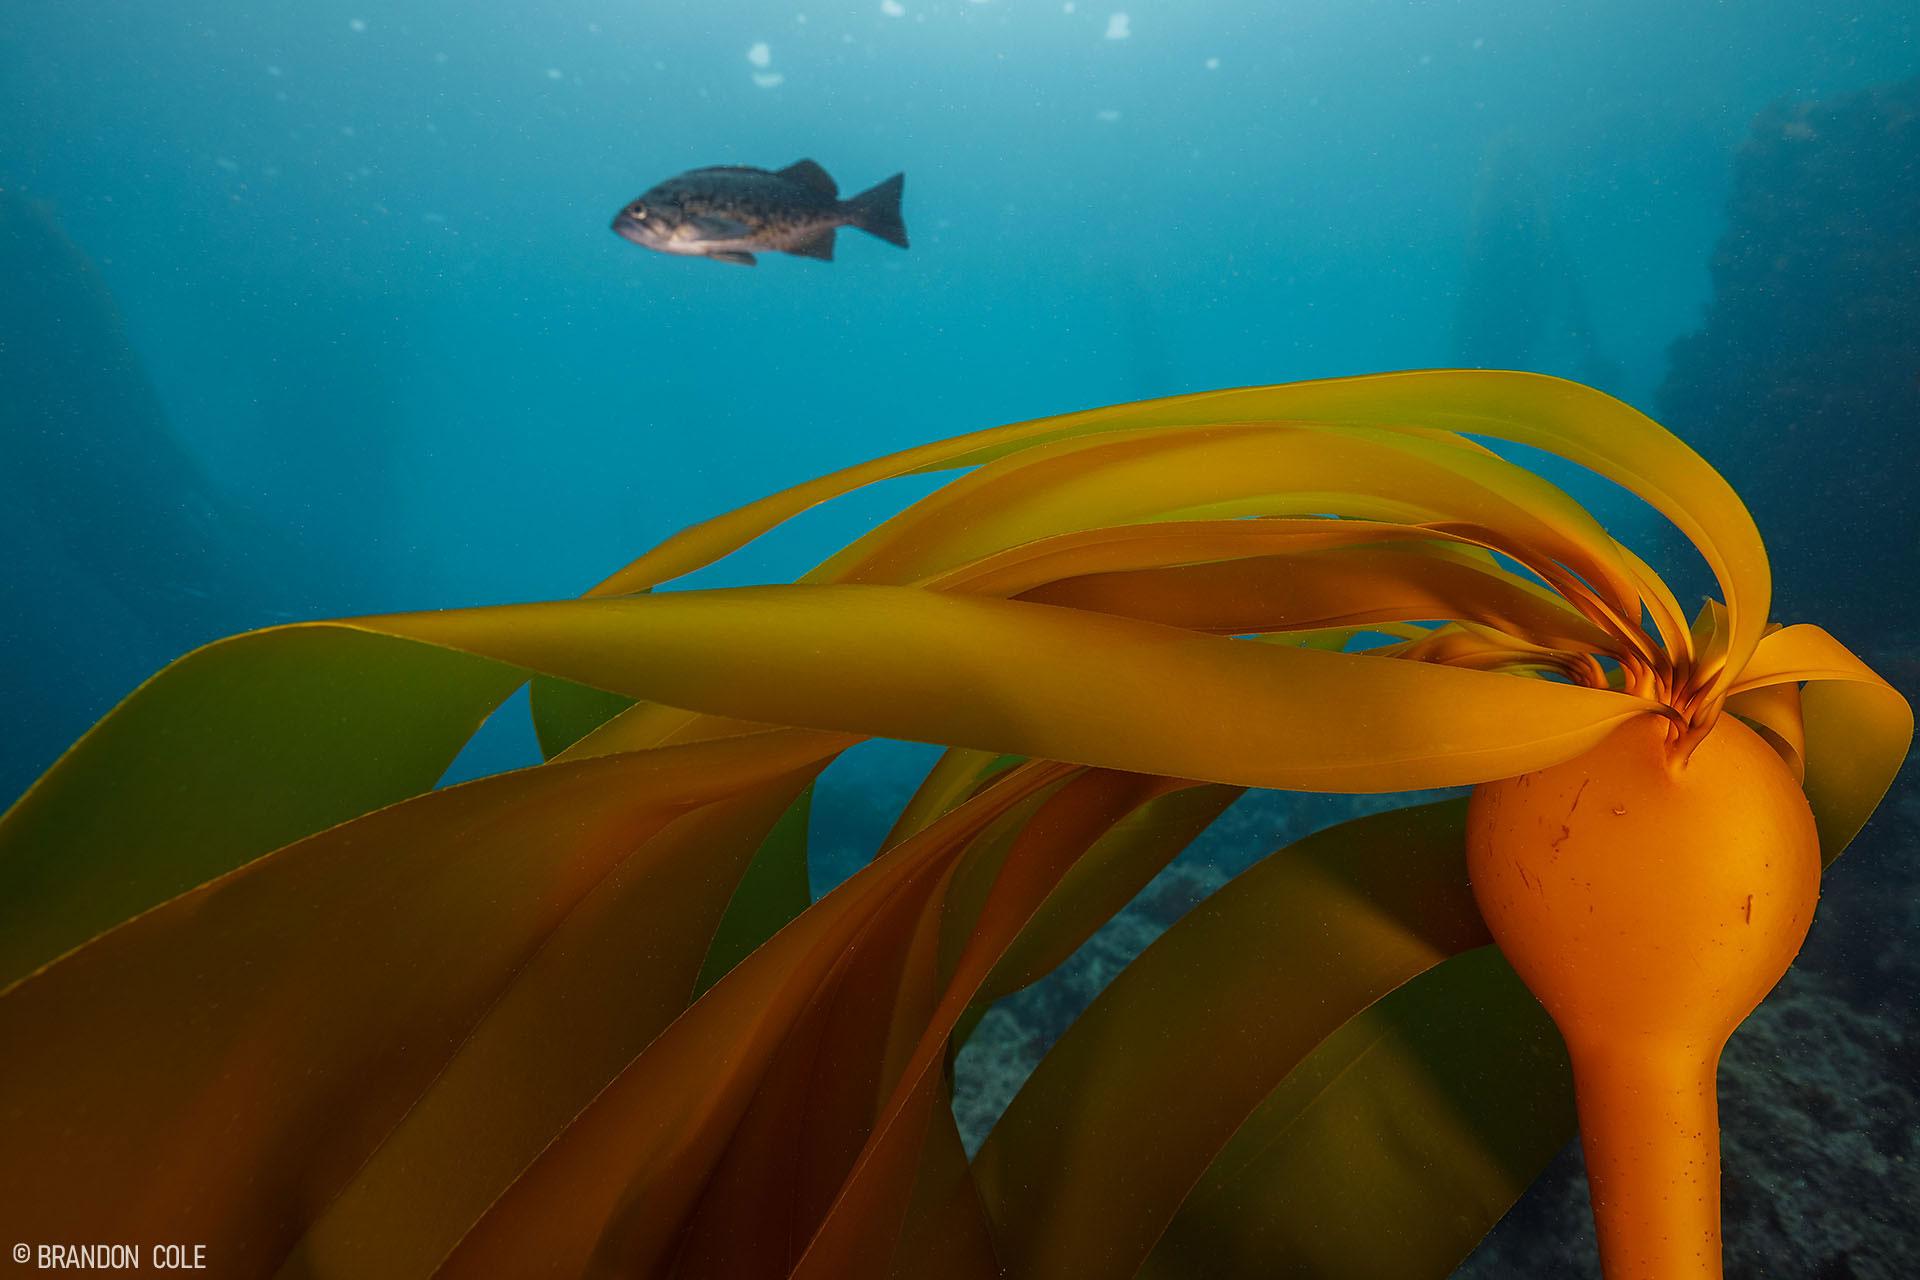 A blue rockfish swims above yellow kelp.